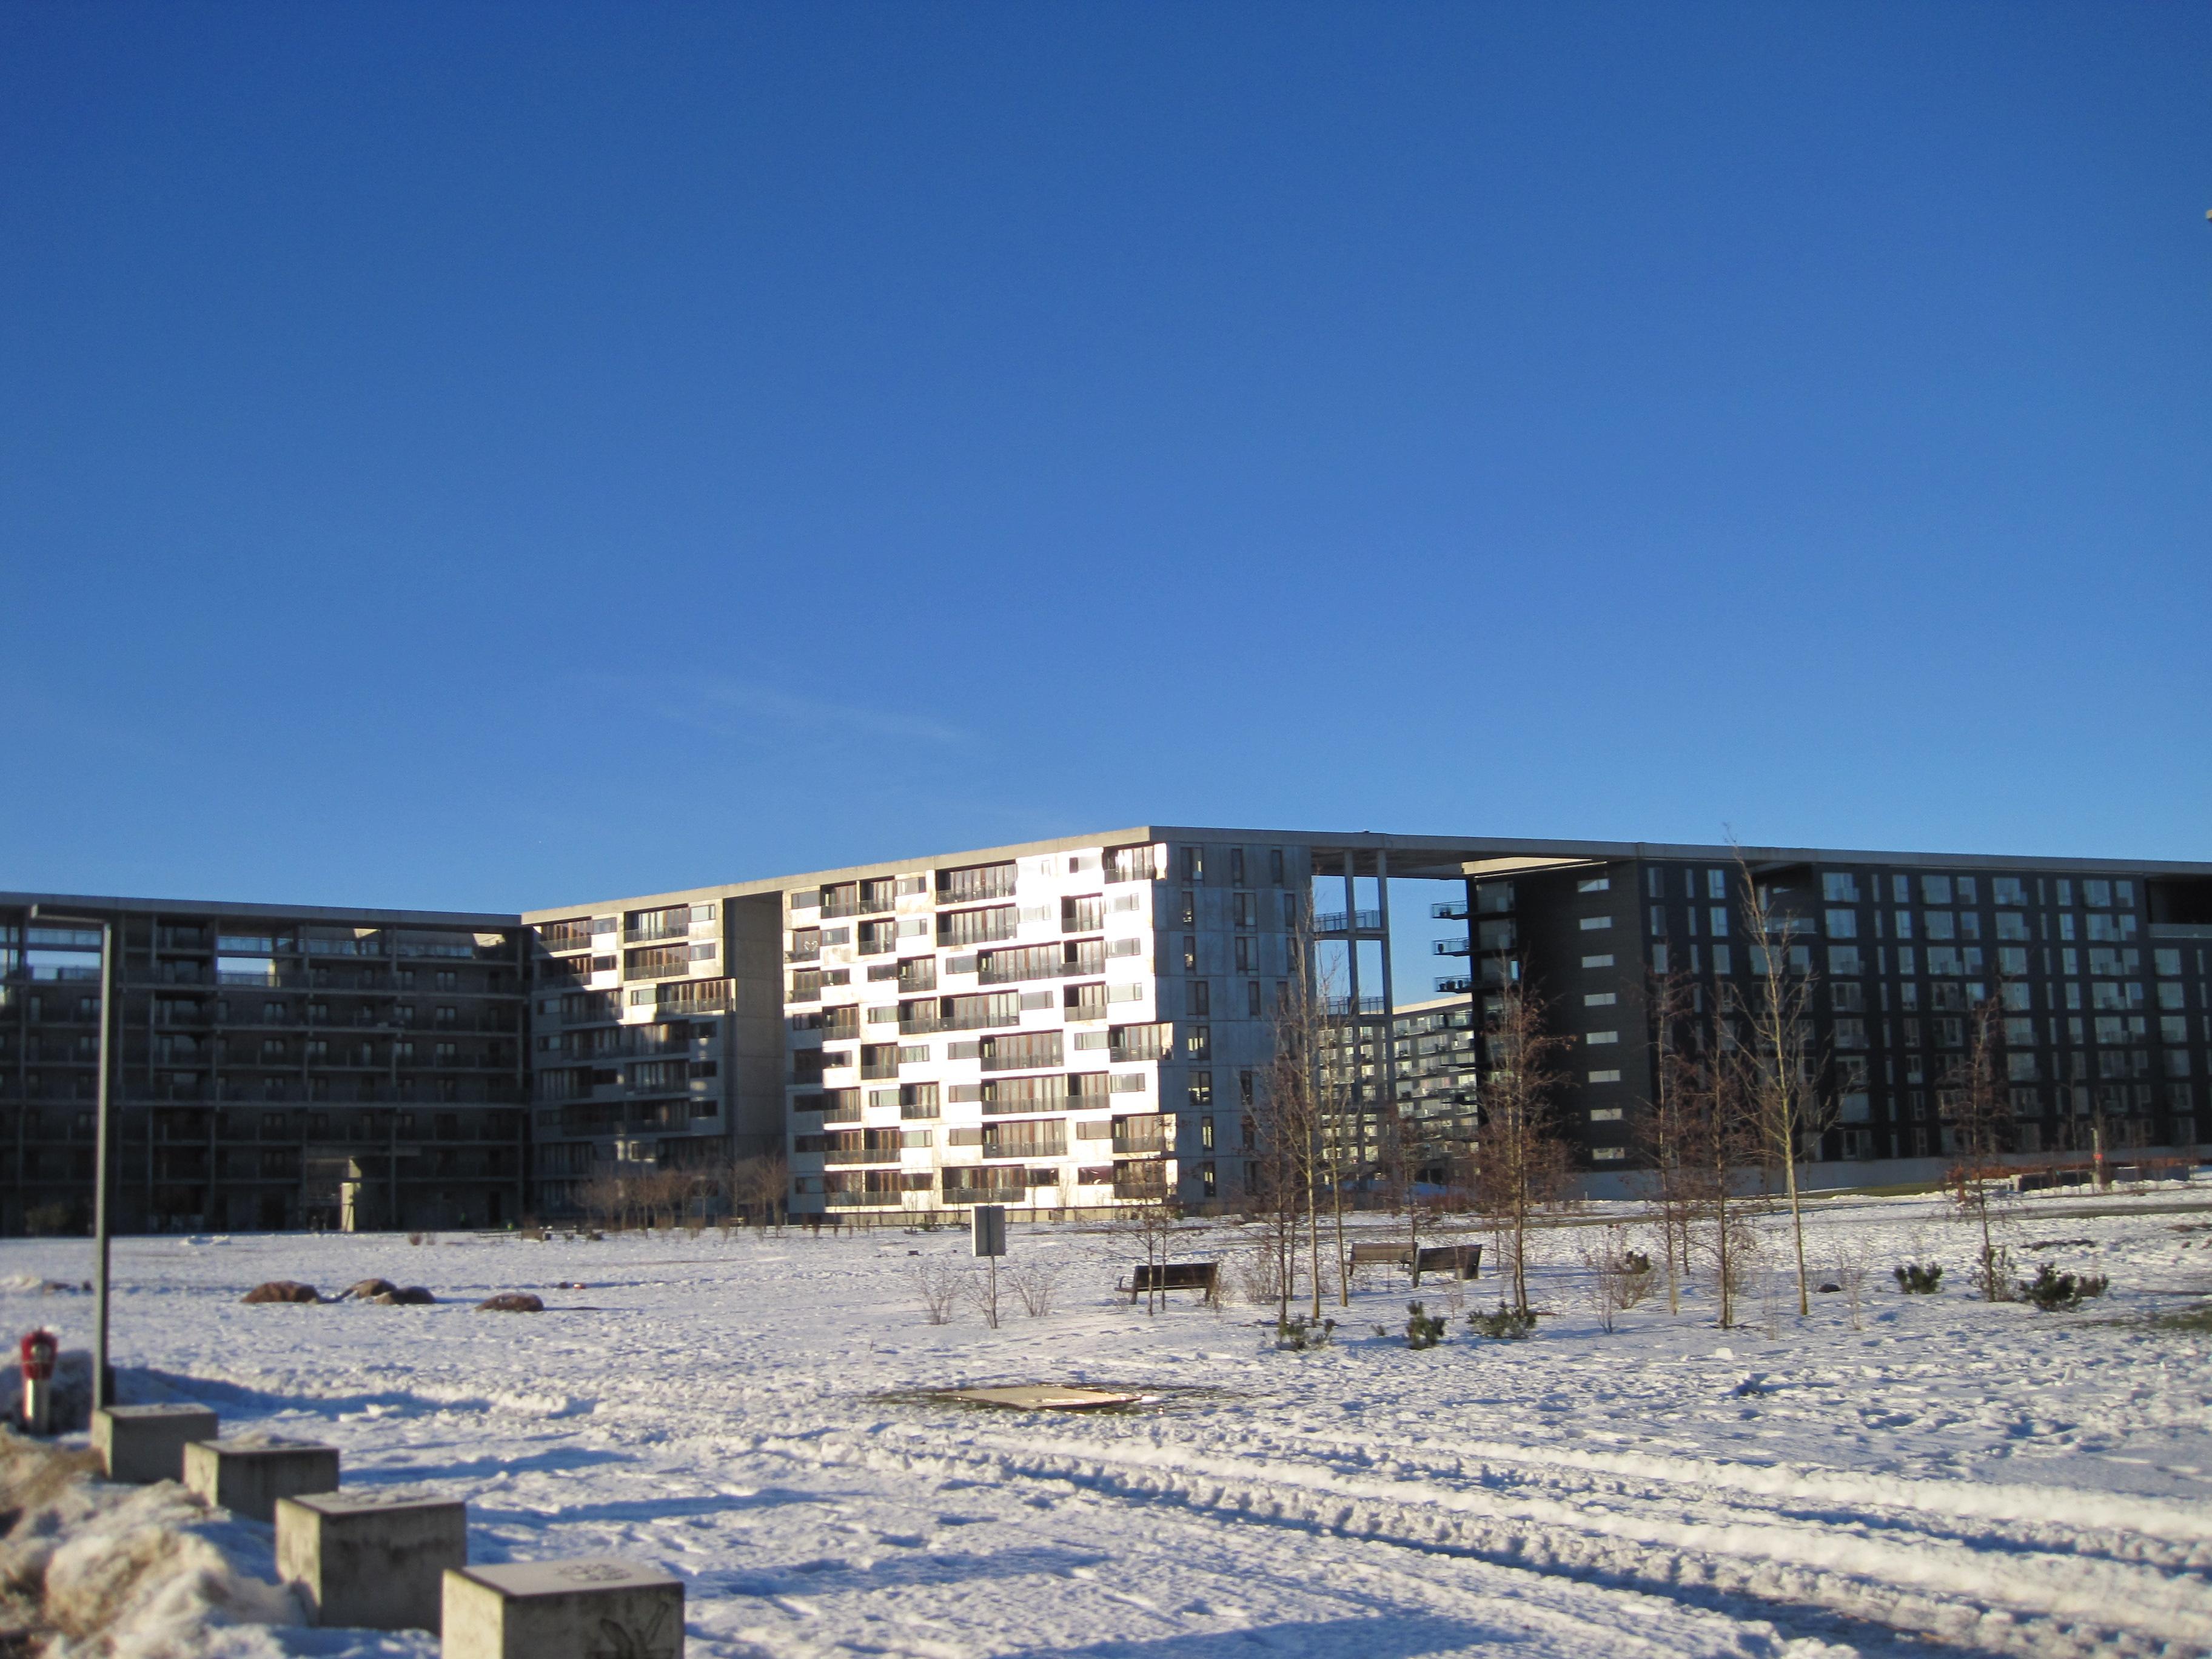 01 Kunstnerisk bygning